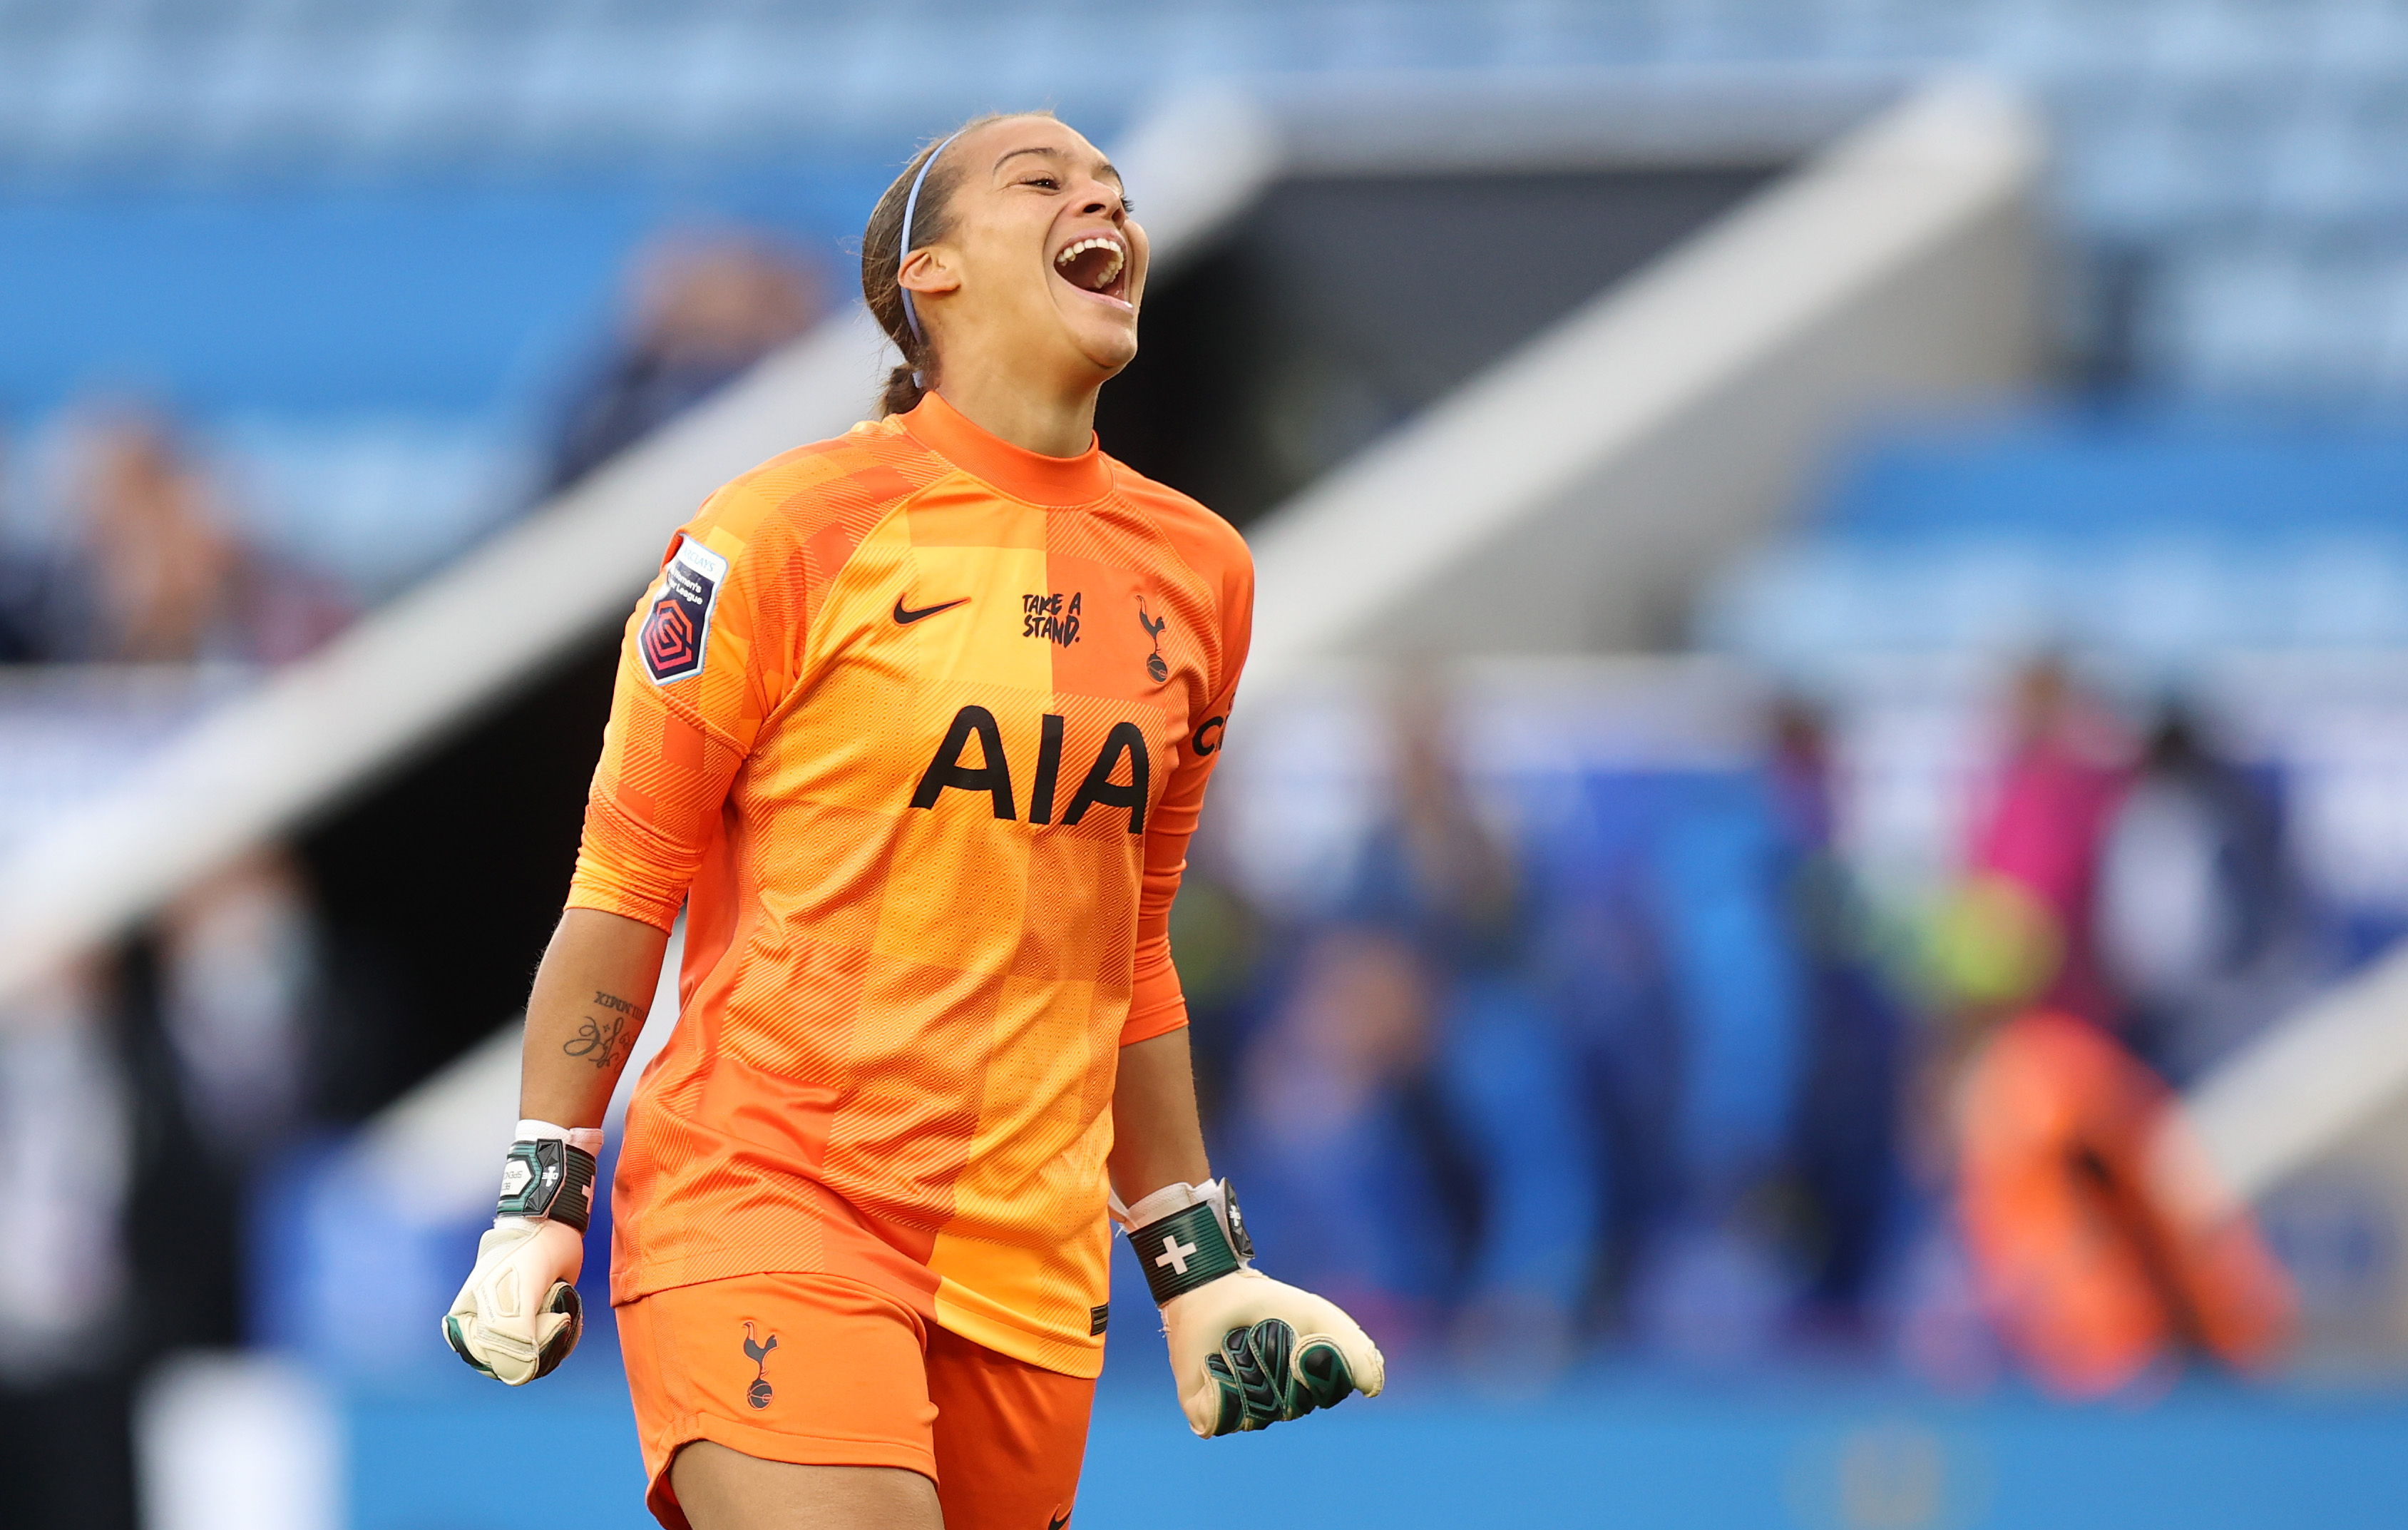 Leicester City Women v Tottenham Hotspur Women - Barclays FA Women's Super League